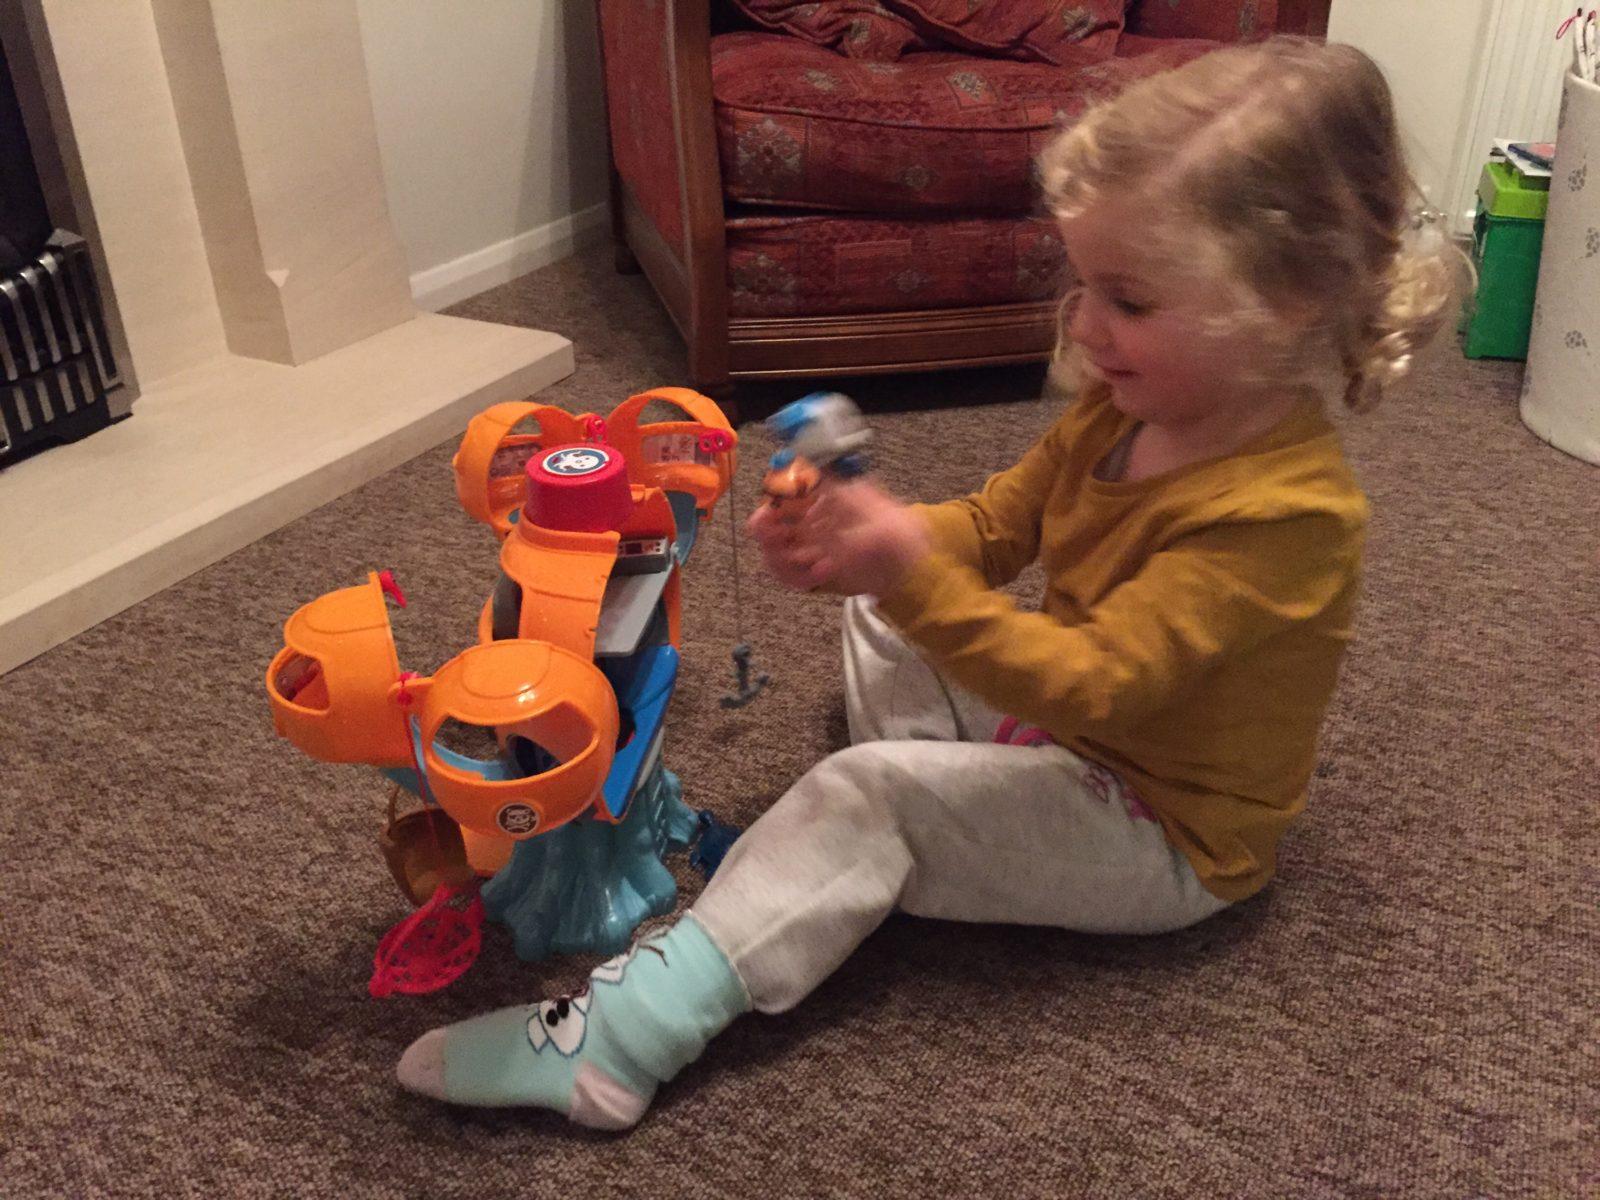 Review: Fisher Price Octonauts Octopod Playset - What Mummy Thinks